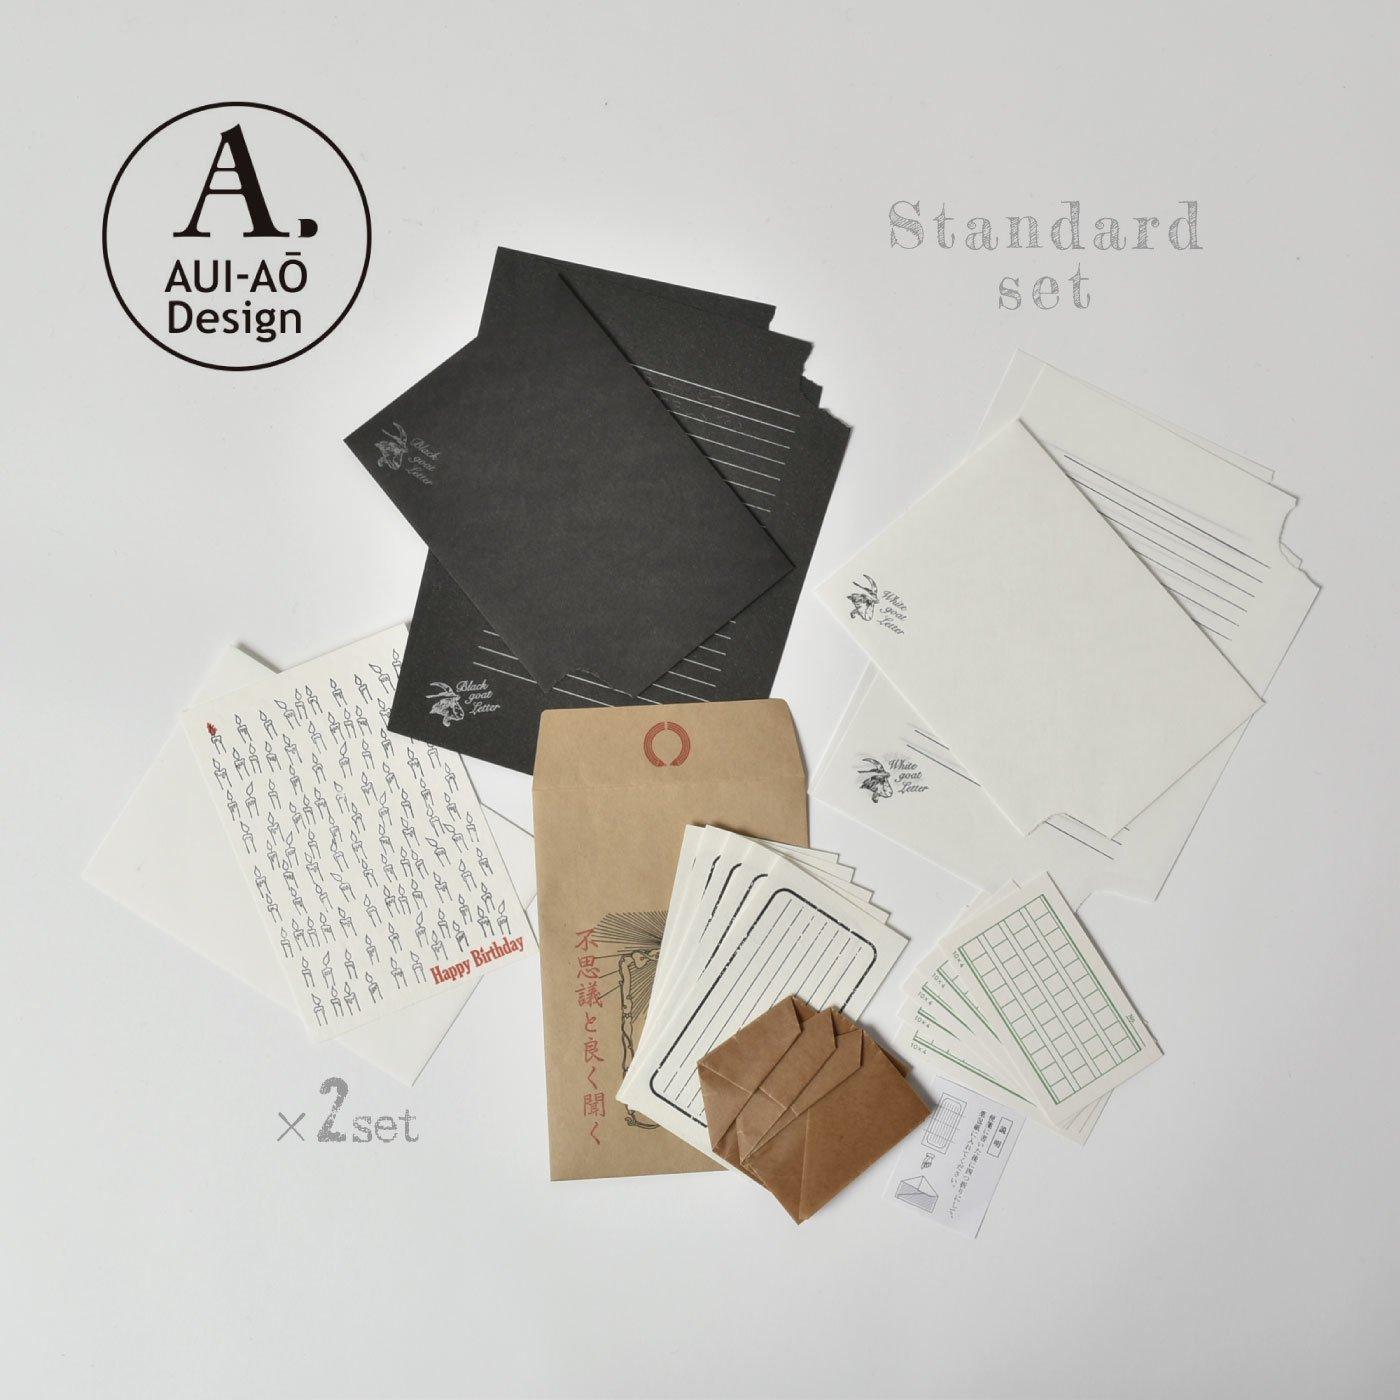 AUI-AO Design スタンダードセット